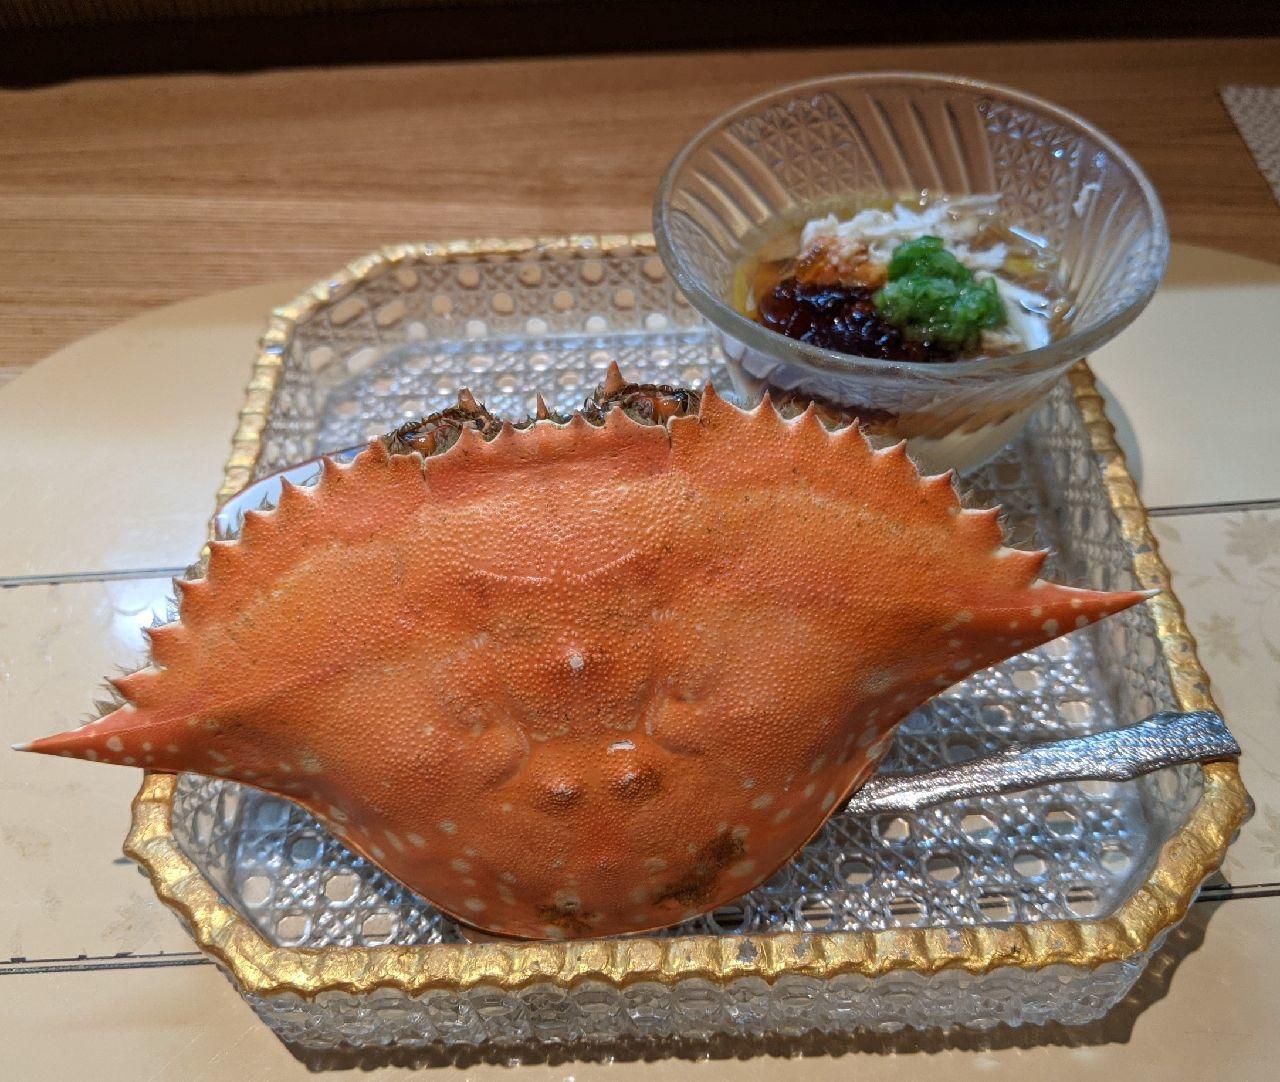 PXL_20210807_105010511胡麻豆腐わたり蟹ビスク、冷やし茶碗蒸し